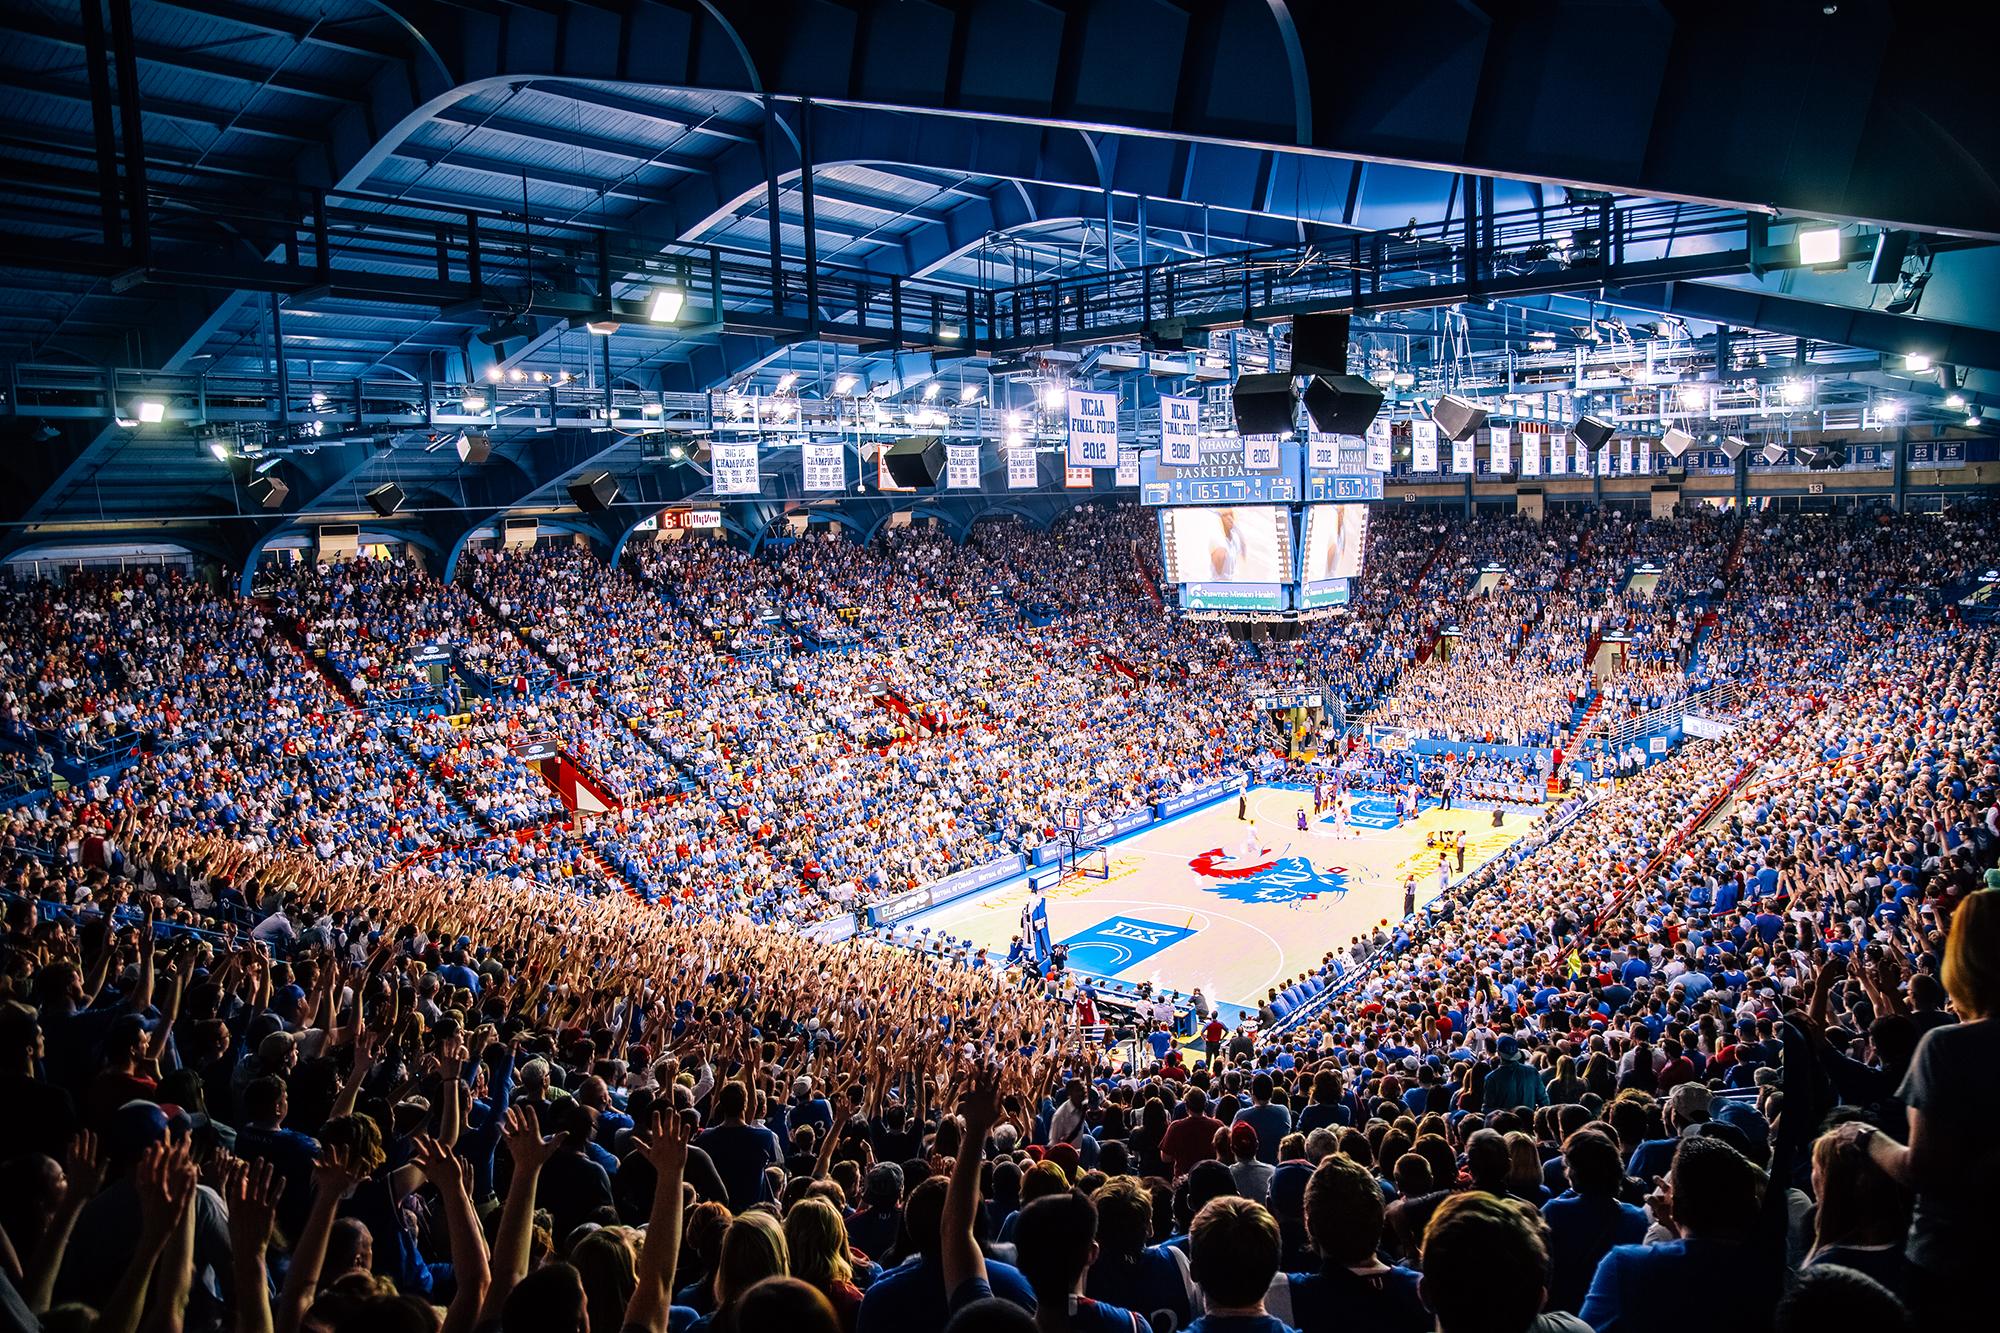 Event: Kansas Basketball   Lawrence, KS  Event Photo and Video